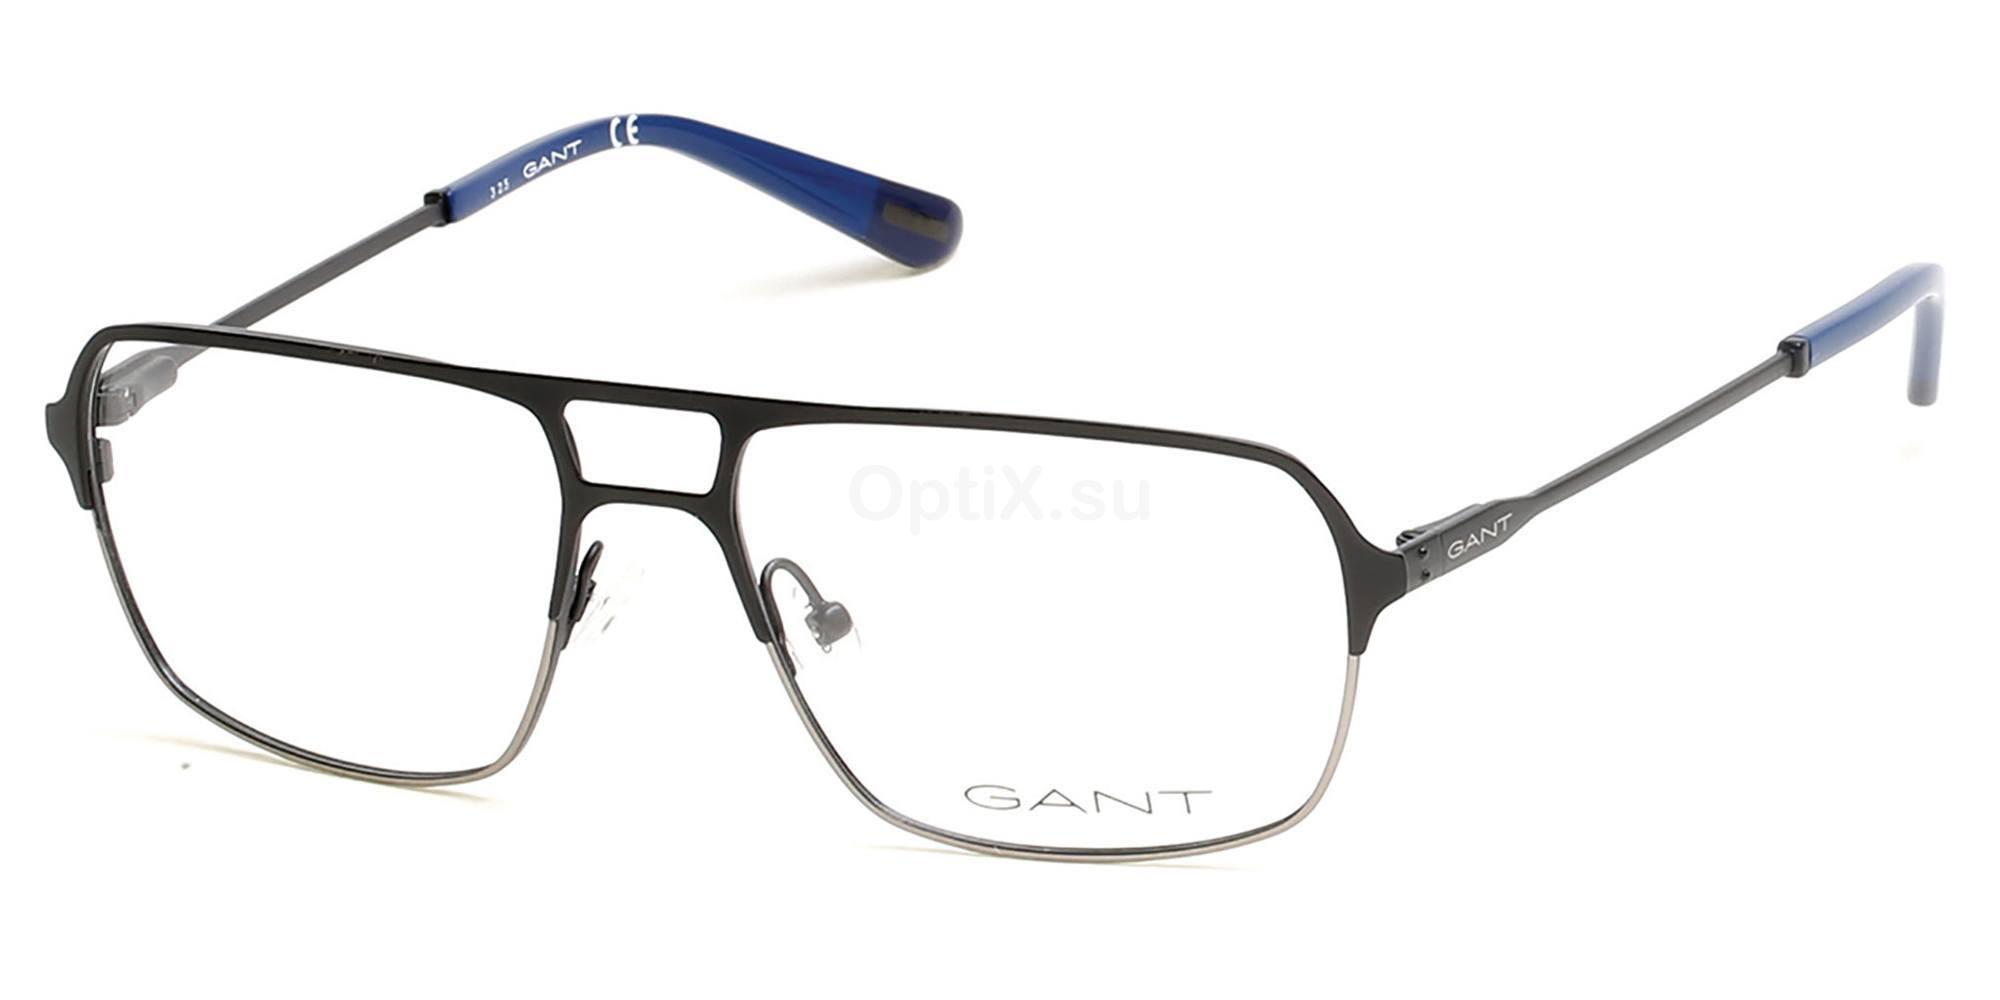 002 GA3126 , Gant